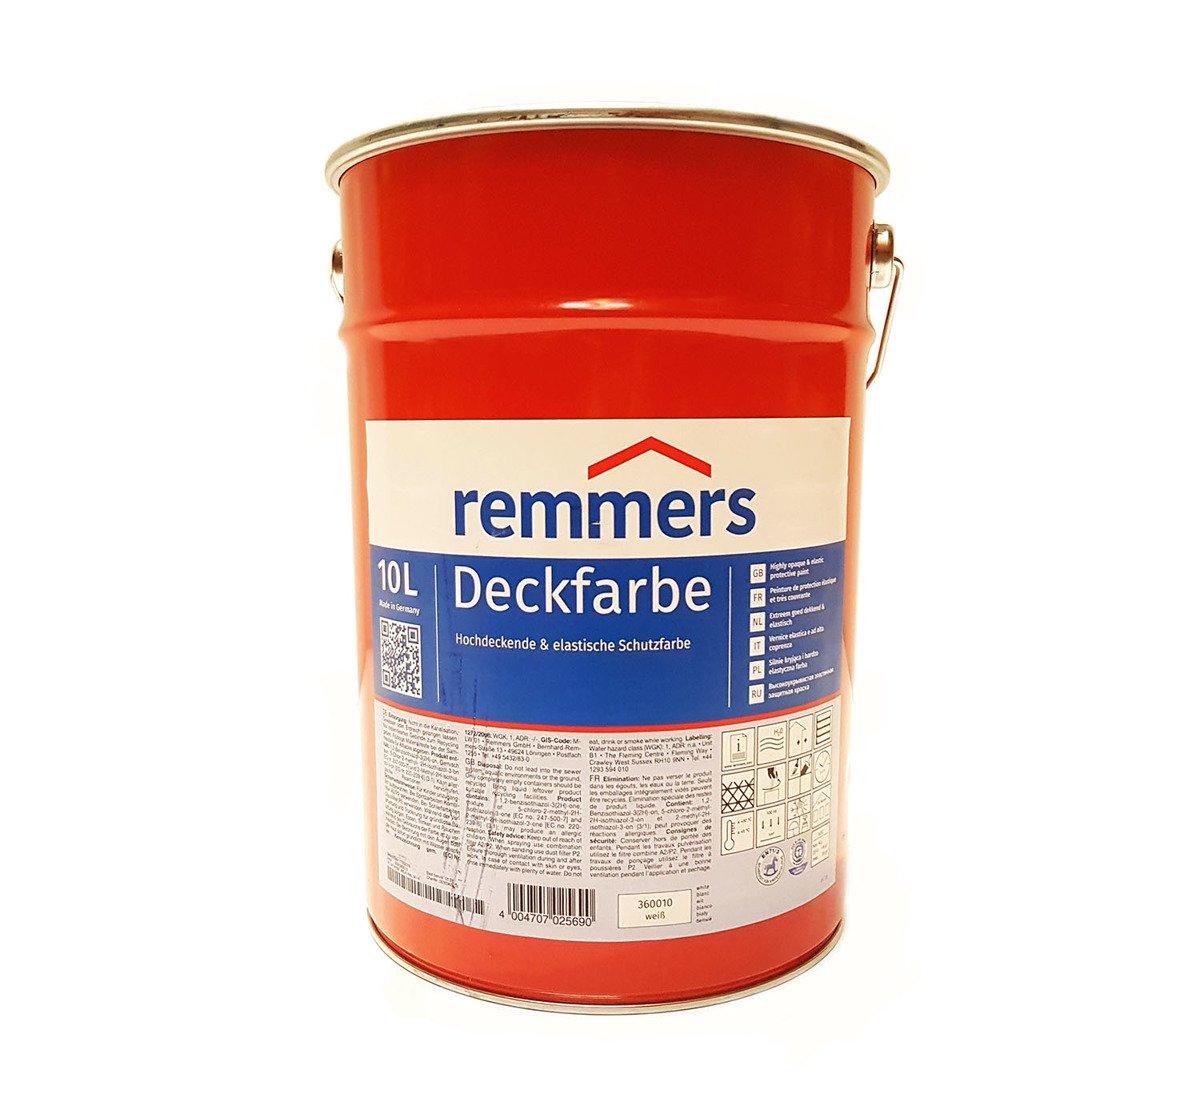 remmers aidol deckfarbe 10 l protection contre les intemp ries couleur blanche ral 9016 ebay. Black Bedroom Furniture Sets. Home Design Ideas